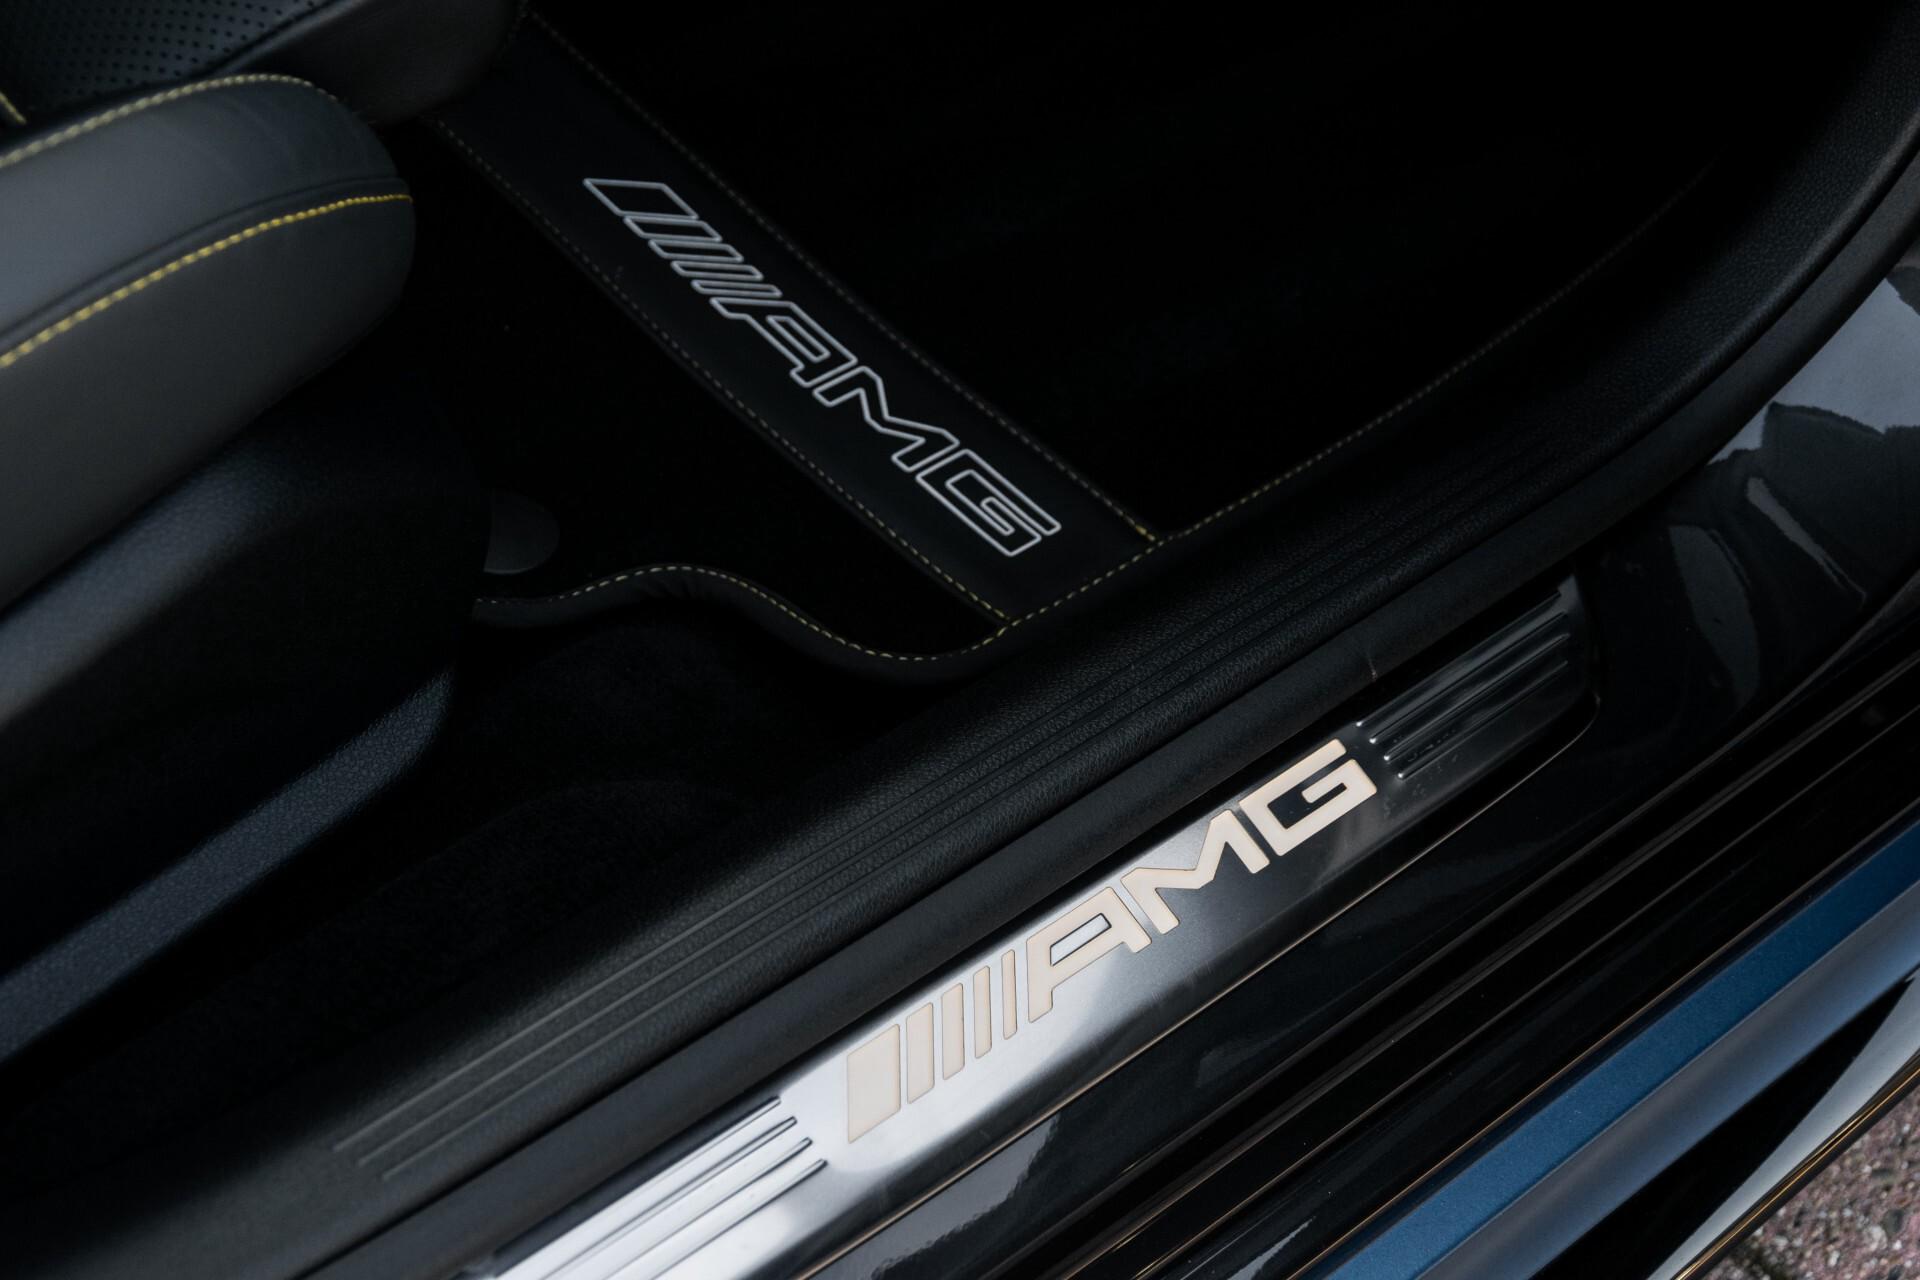 Mercedes-Benz AMG GT 4-Door Coupe 63 S 4MATIC+ Edition 1 Keramisch/Carbon/First Class/Dynamic Plus/Burmester High End 3D Aut9 Foto 67